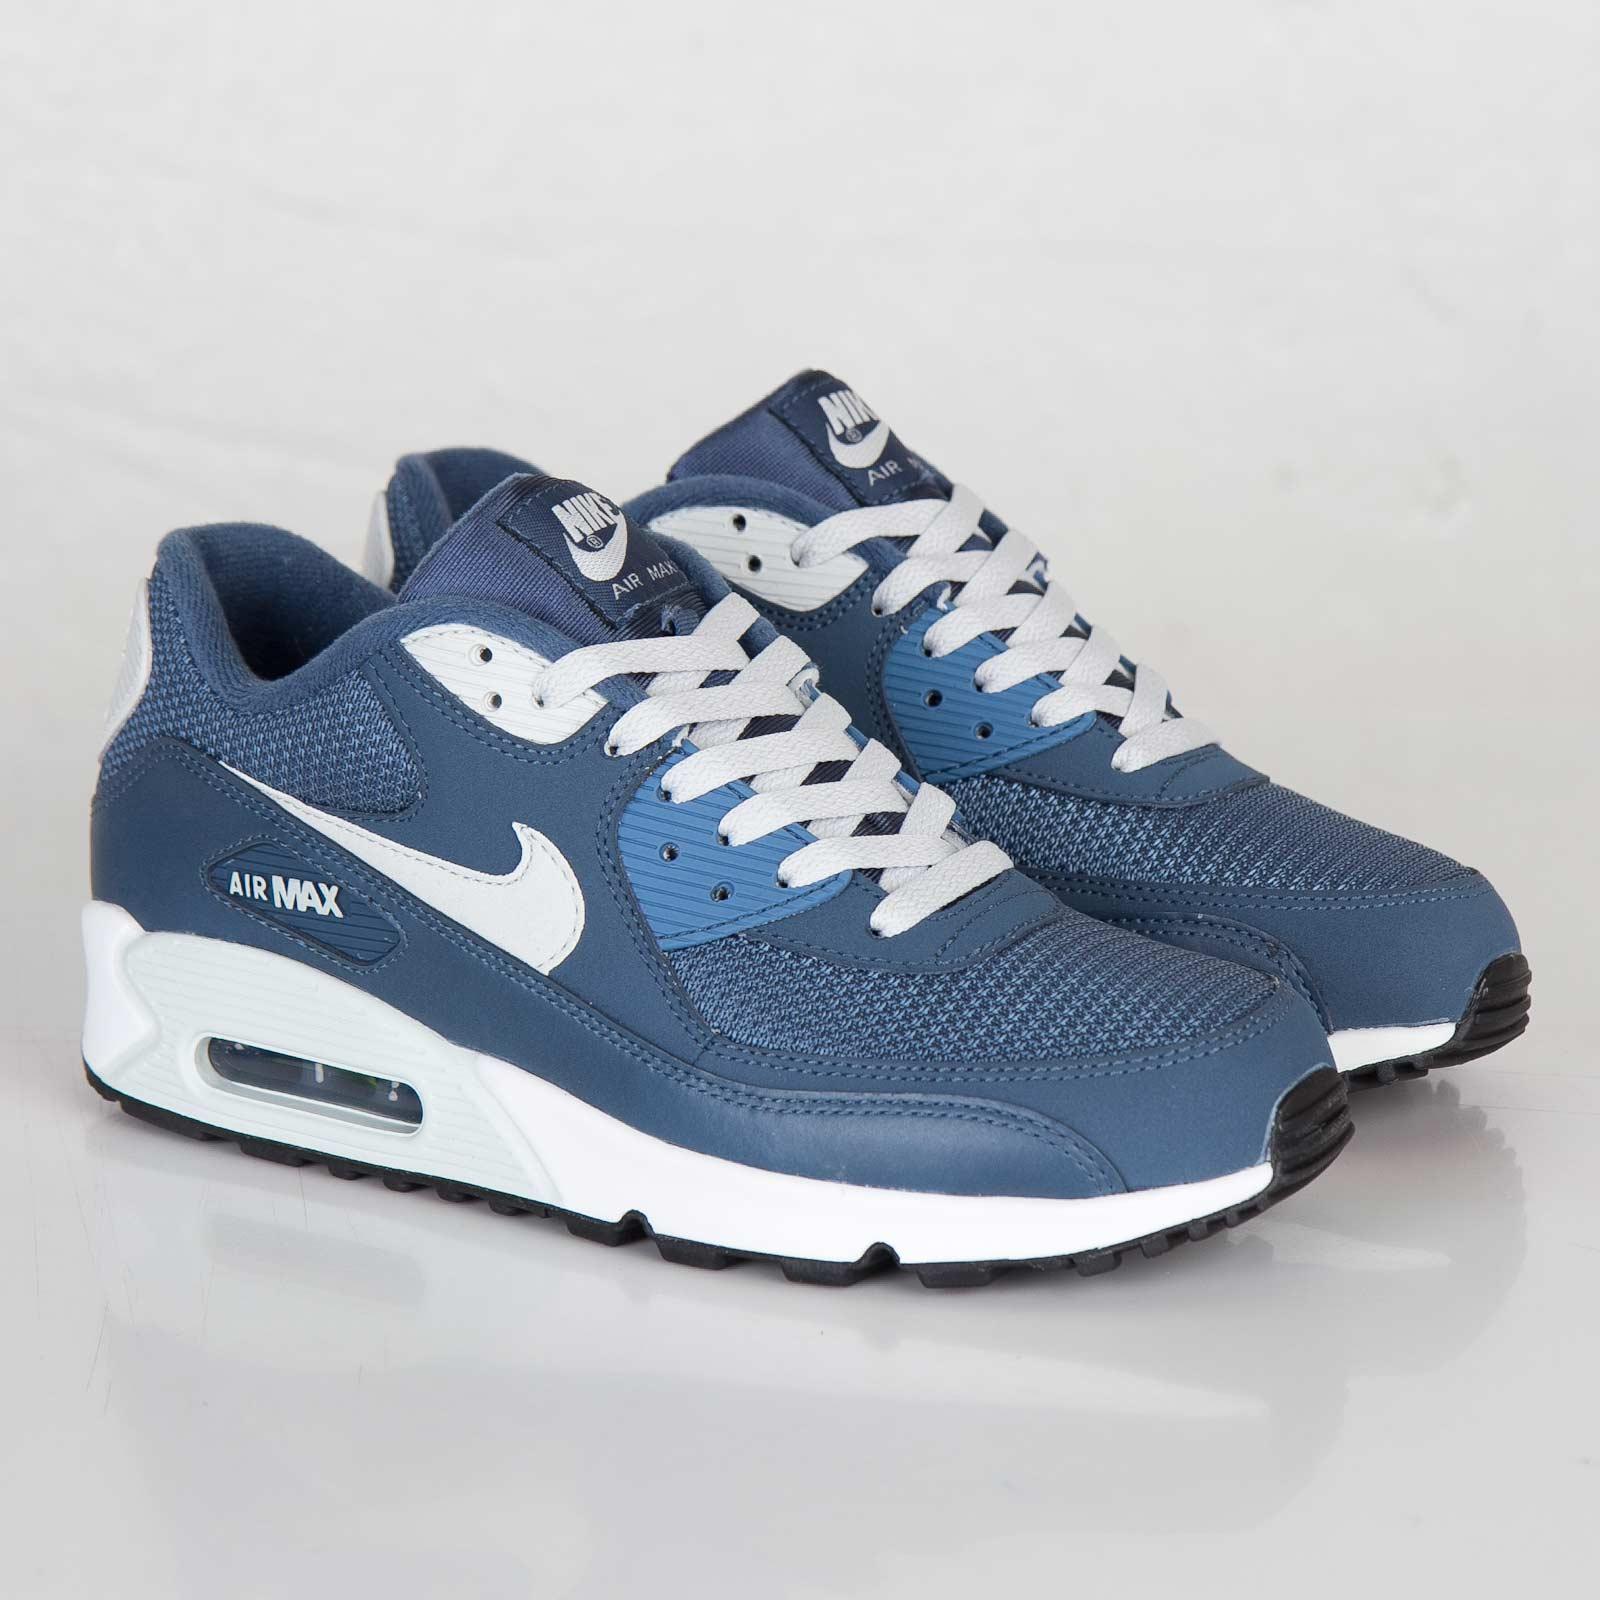 Nike Air Max 90 Essential - 537384-405 - SNS   sneakers ...